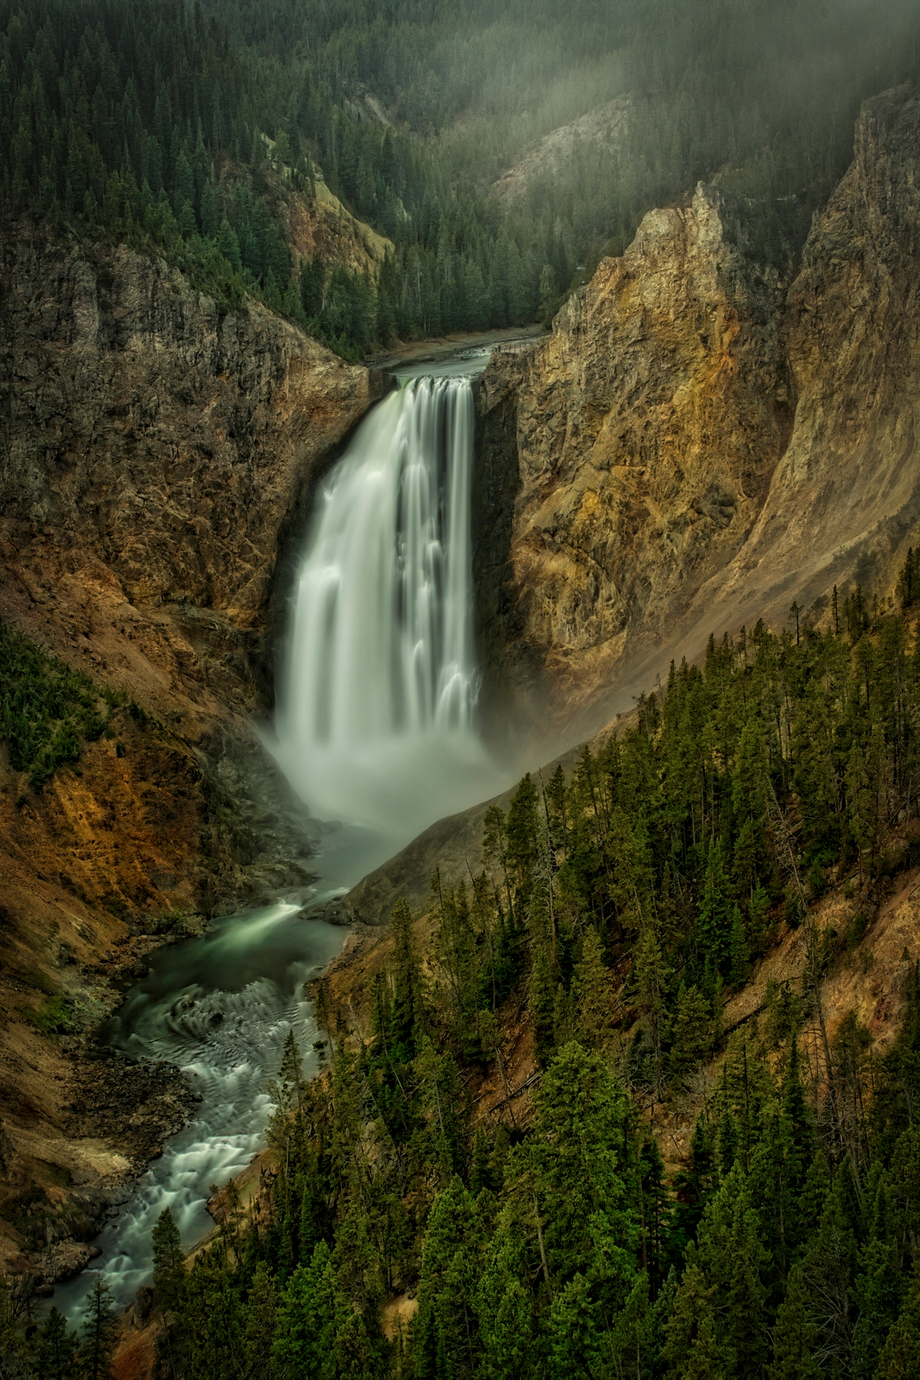 Yellowstone Falls Gloom by conniemcclaran - Celebrating Nature Photo Contest Vol 5